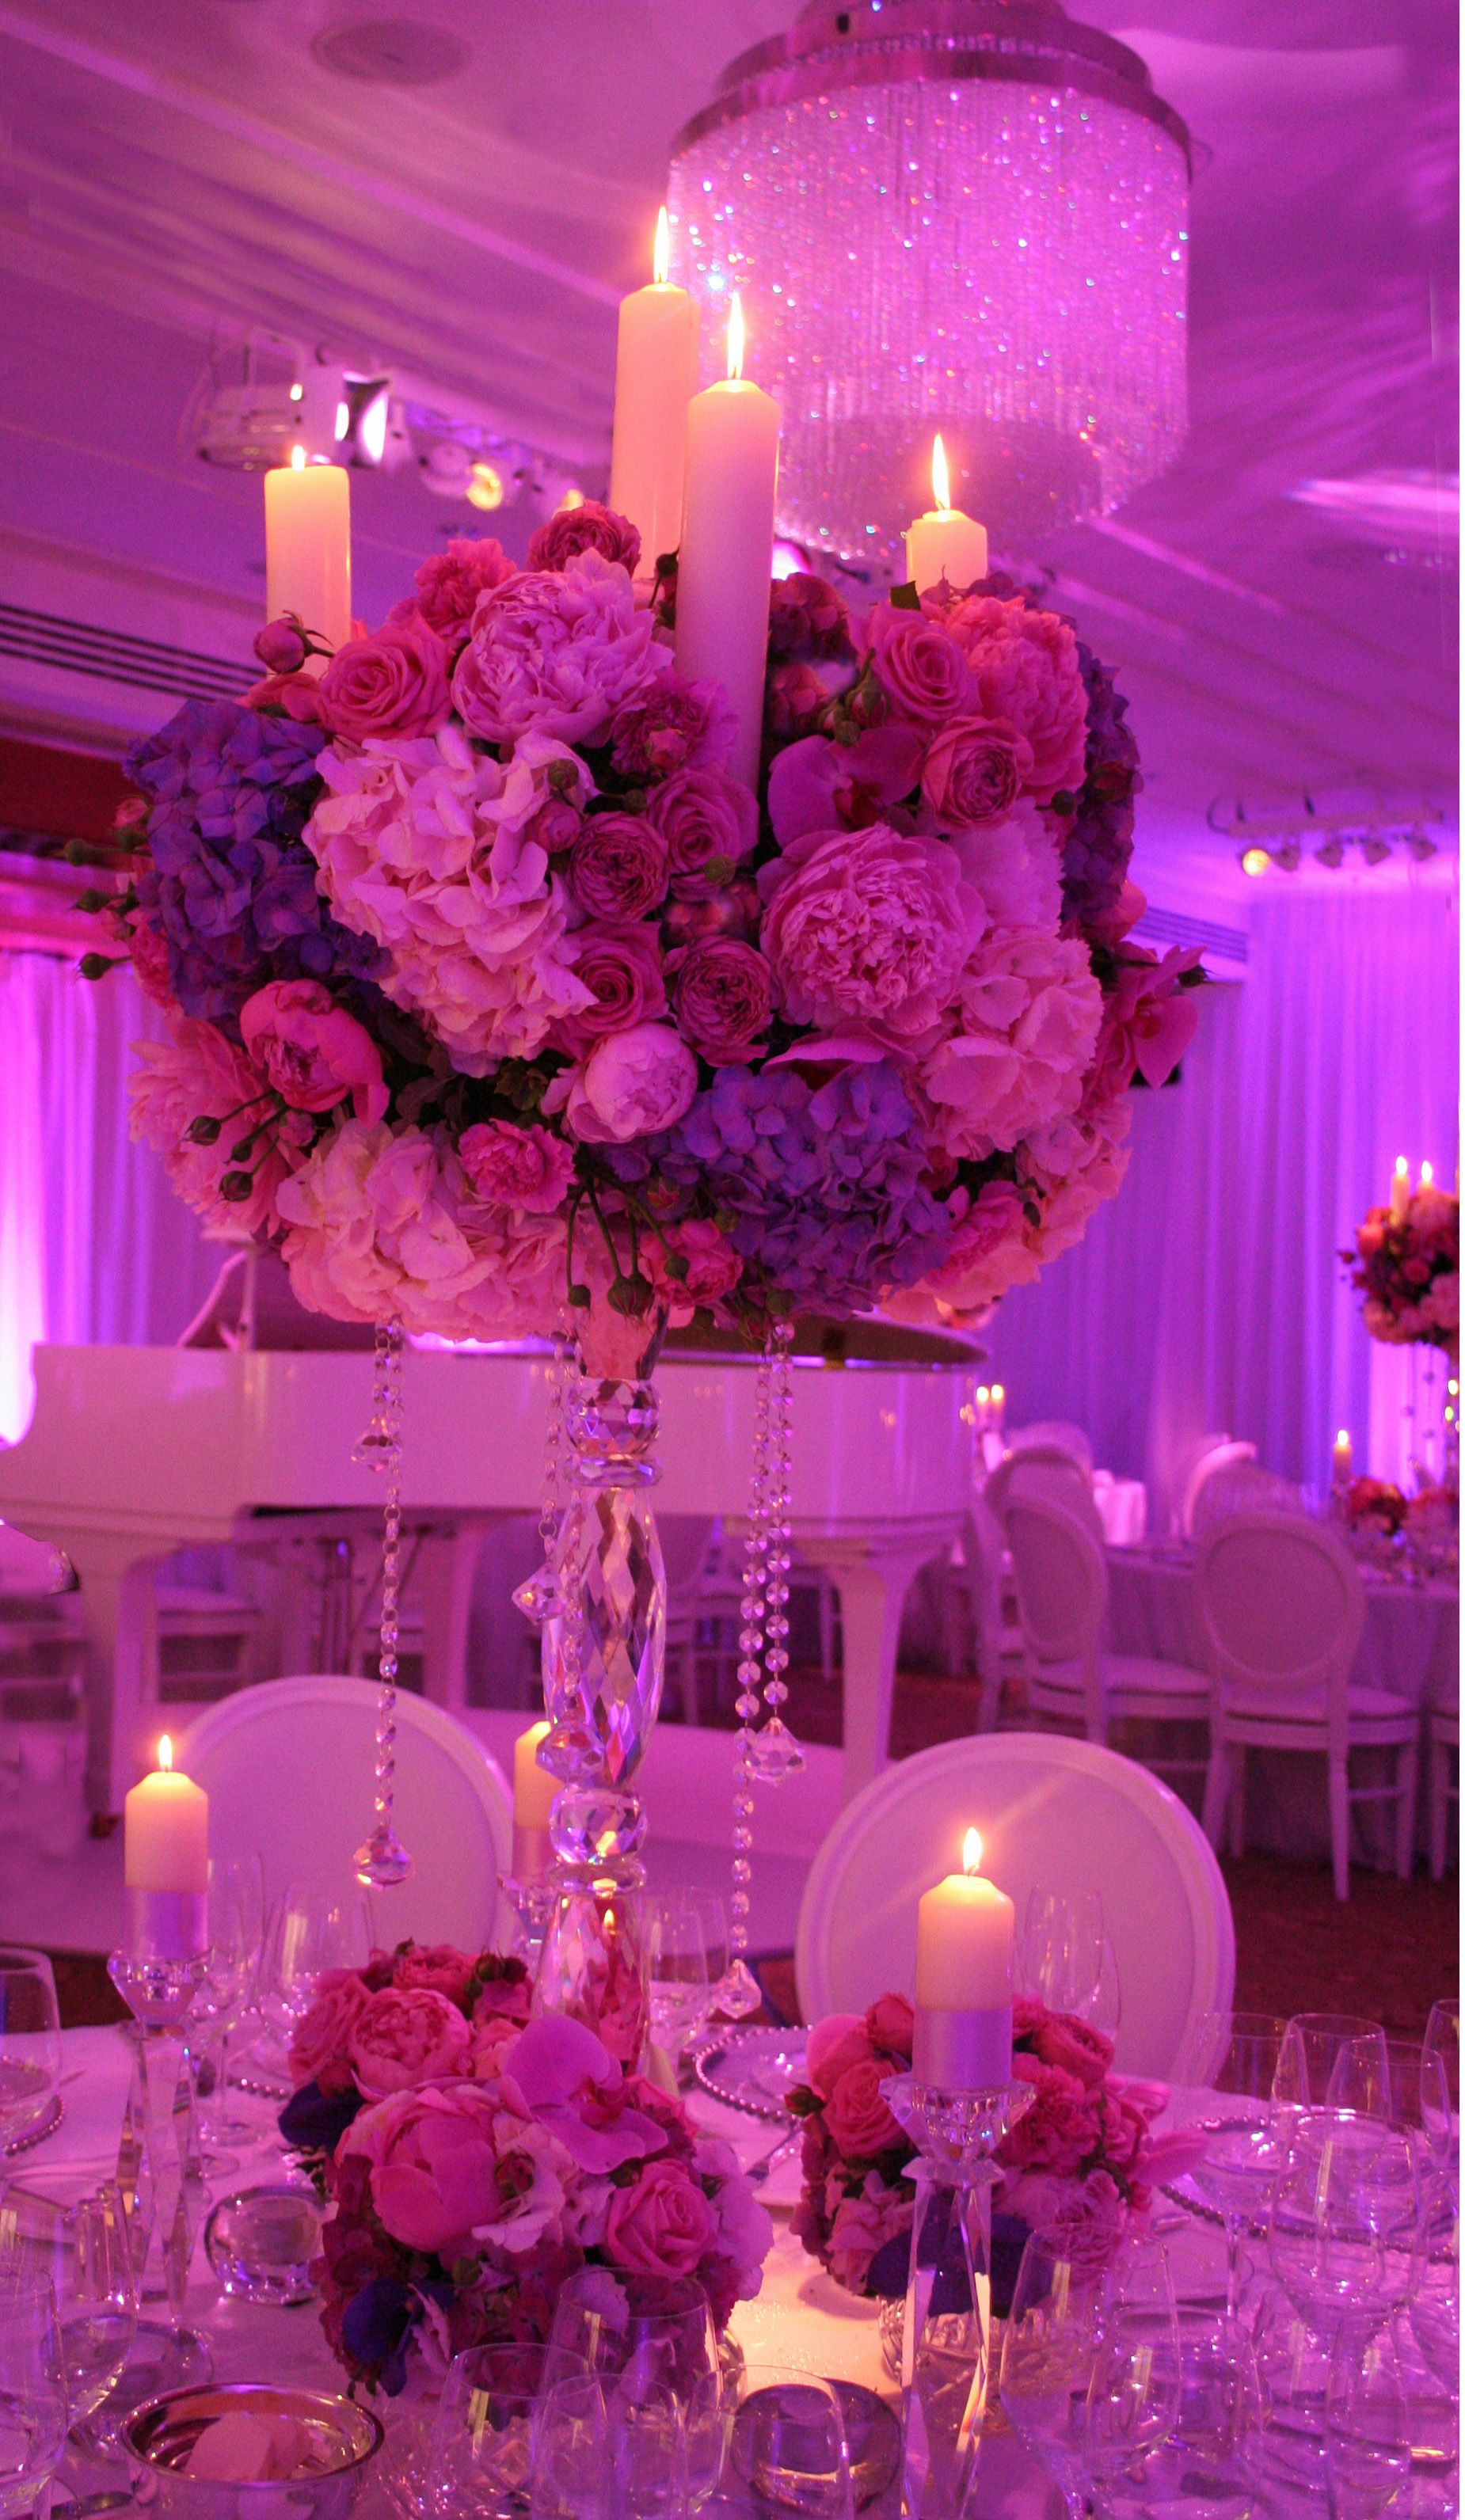 Lilac wedding decoration ideas  Wedding at the Four Seasons Park Lane London  fLOweR pOWeR